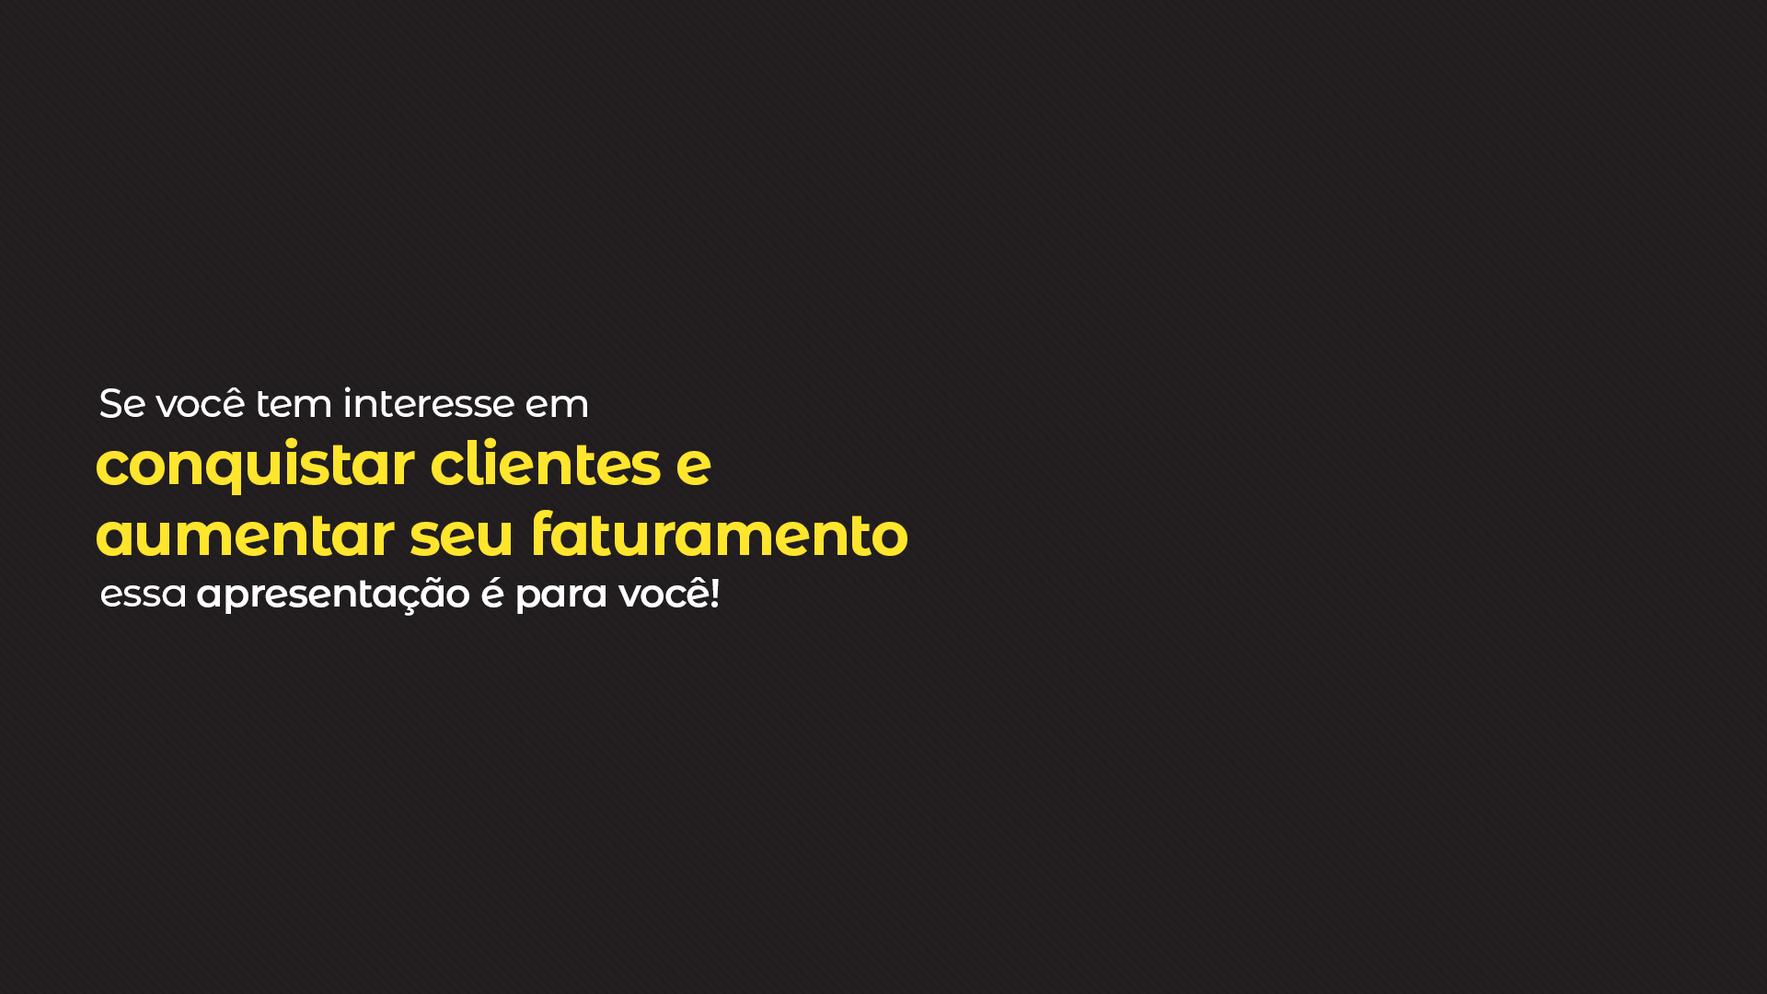 VLD_Apresentação_AVLD_02_Title.png